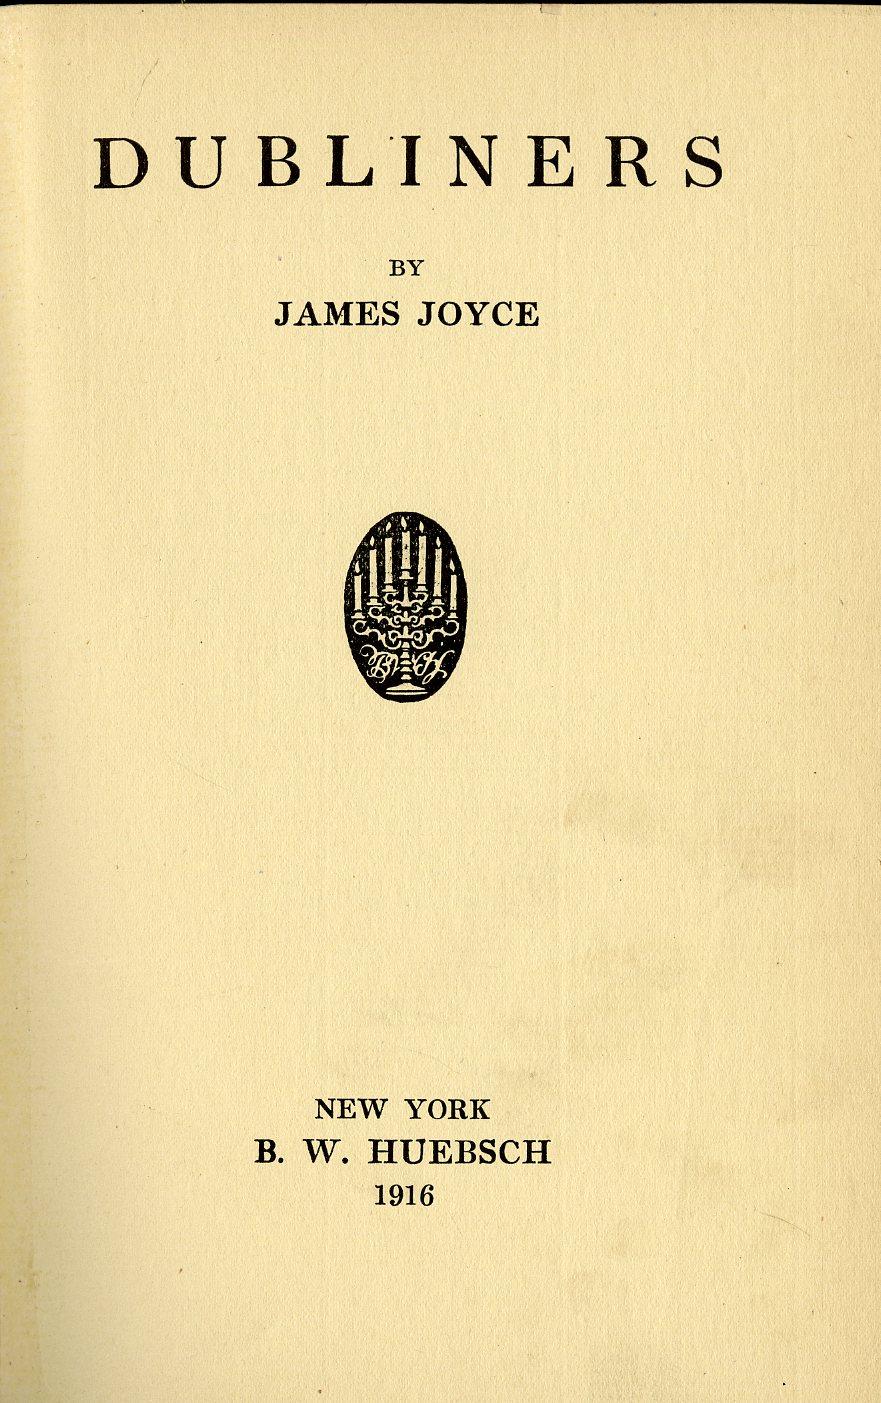 Lot 188 - First American Edition Joyce (James) Dubliners, 8vo N. York (B.W. Huebsch) 1916. First U.S.